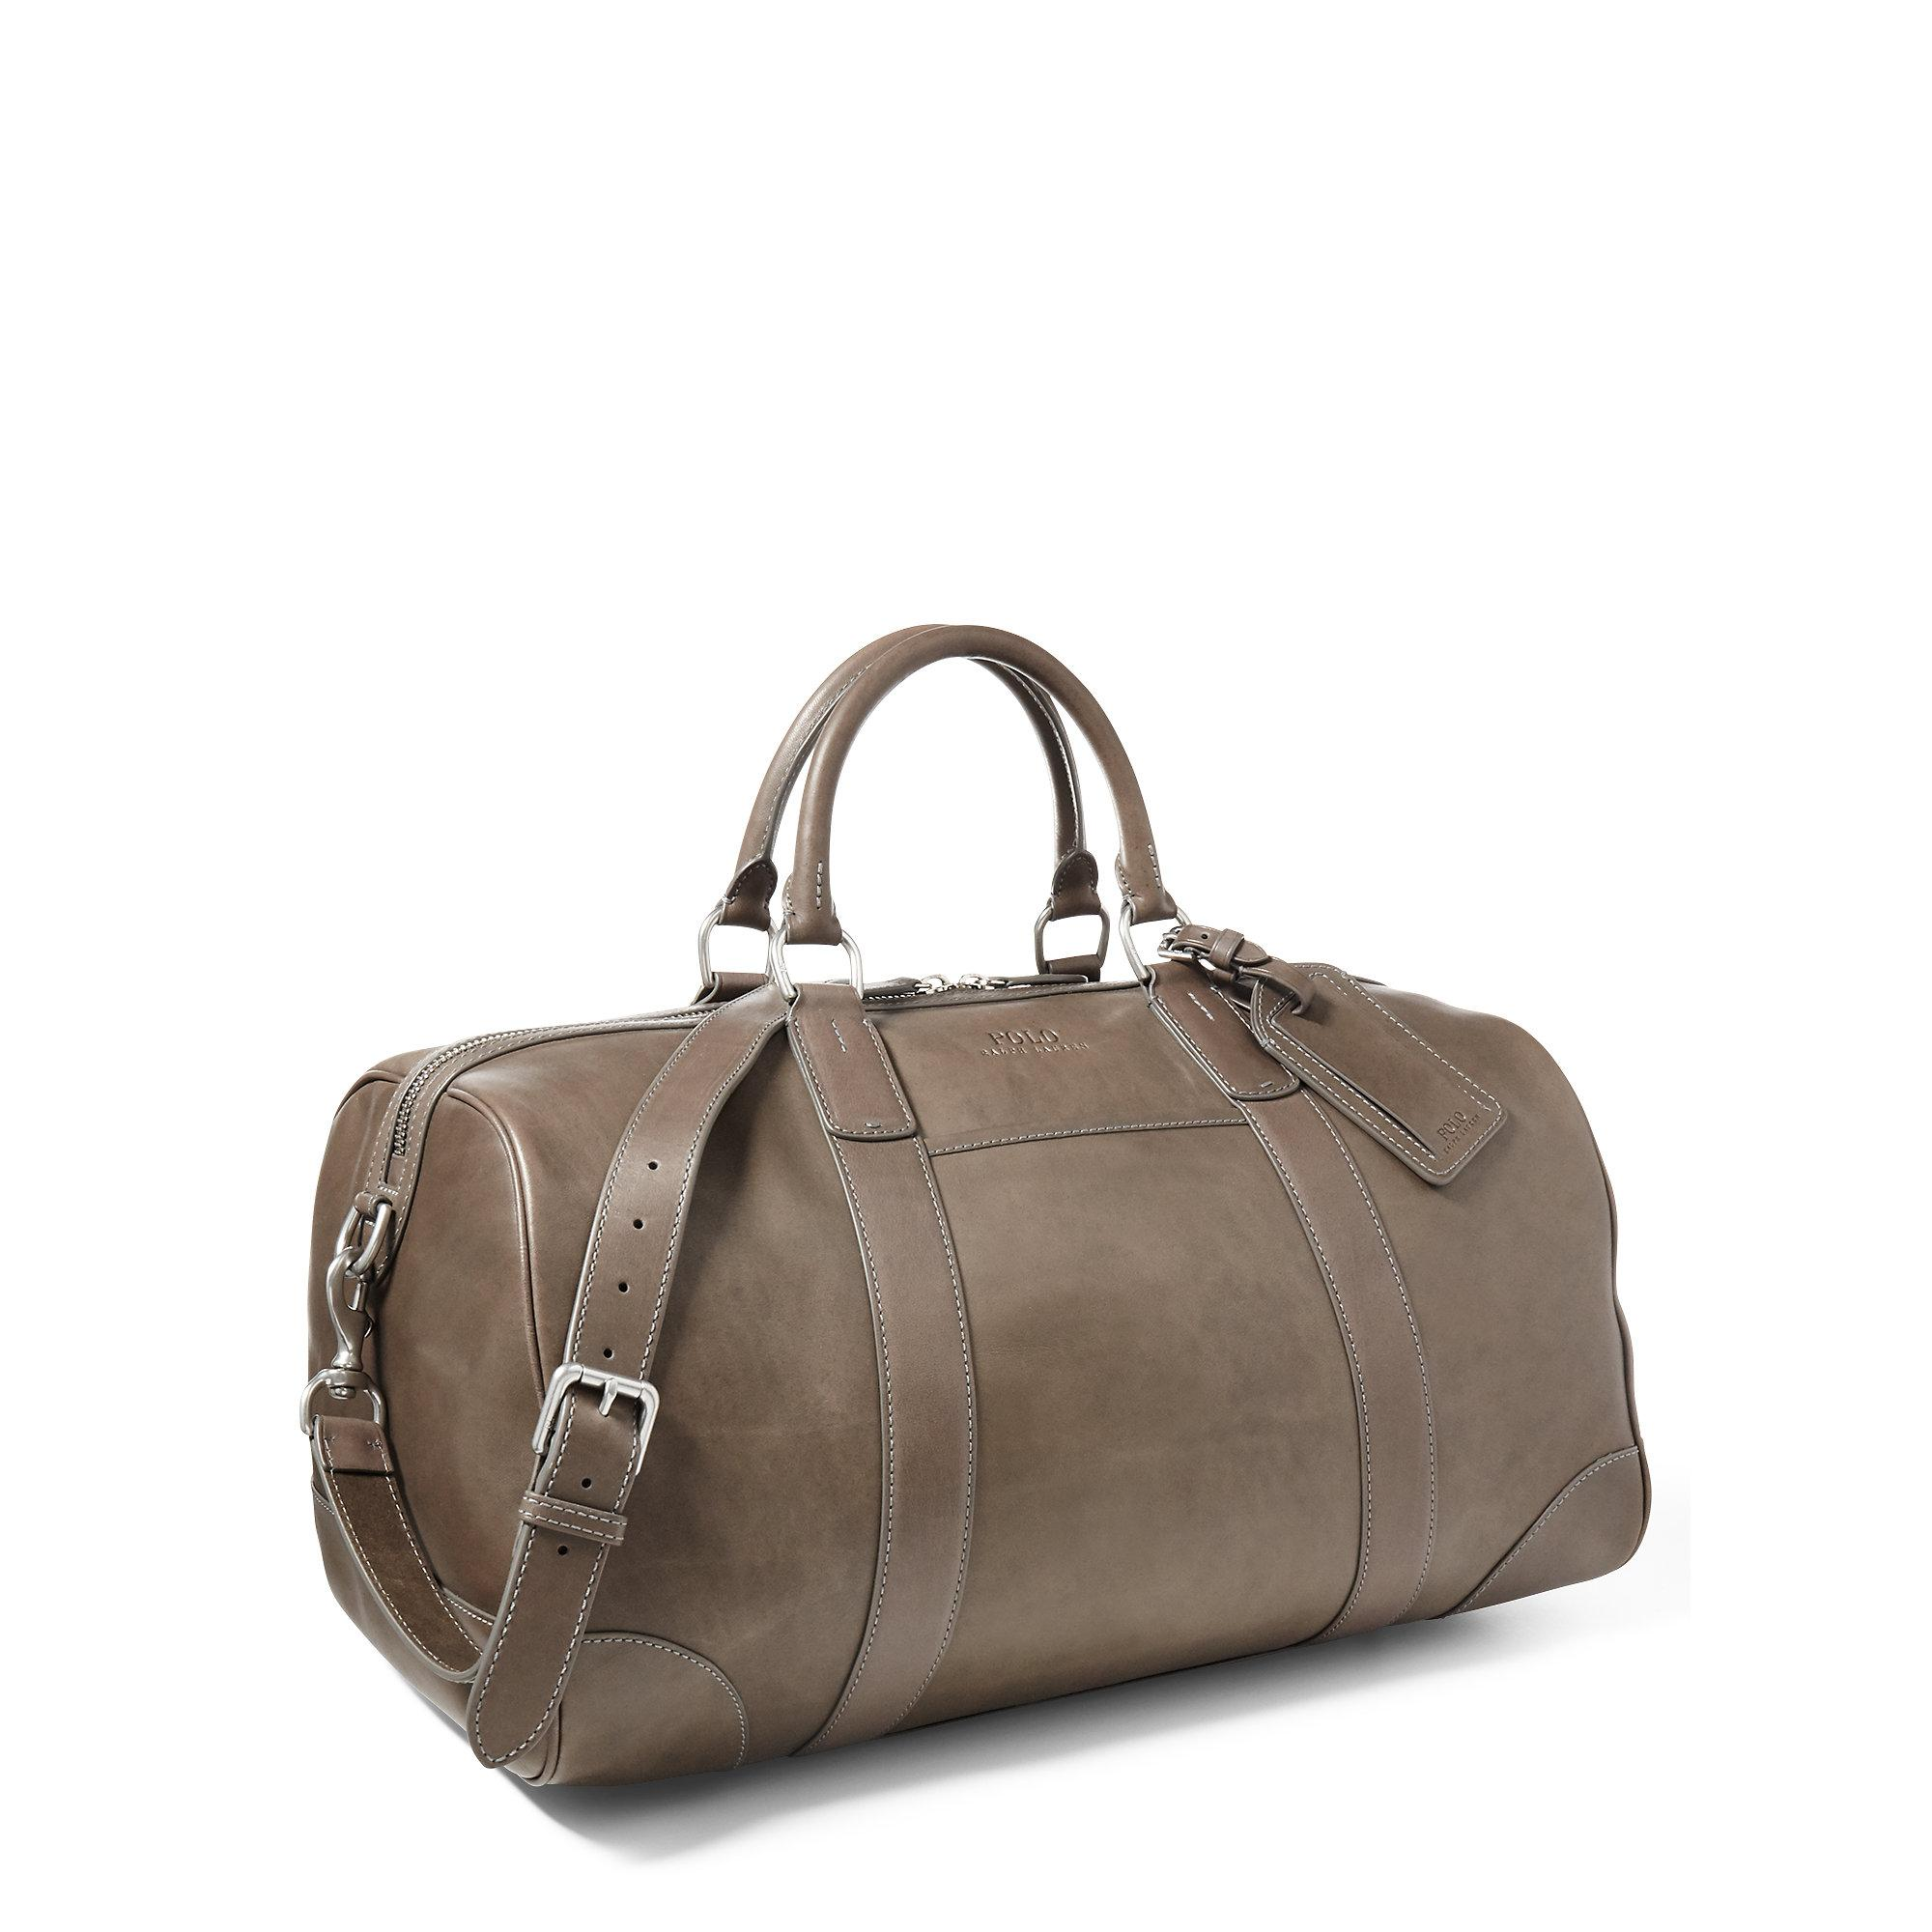 68324b4e2581 Polo Ralph Lauren Core Leather Duffle Bag